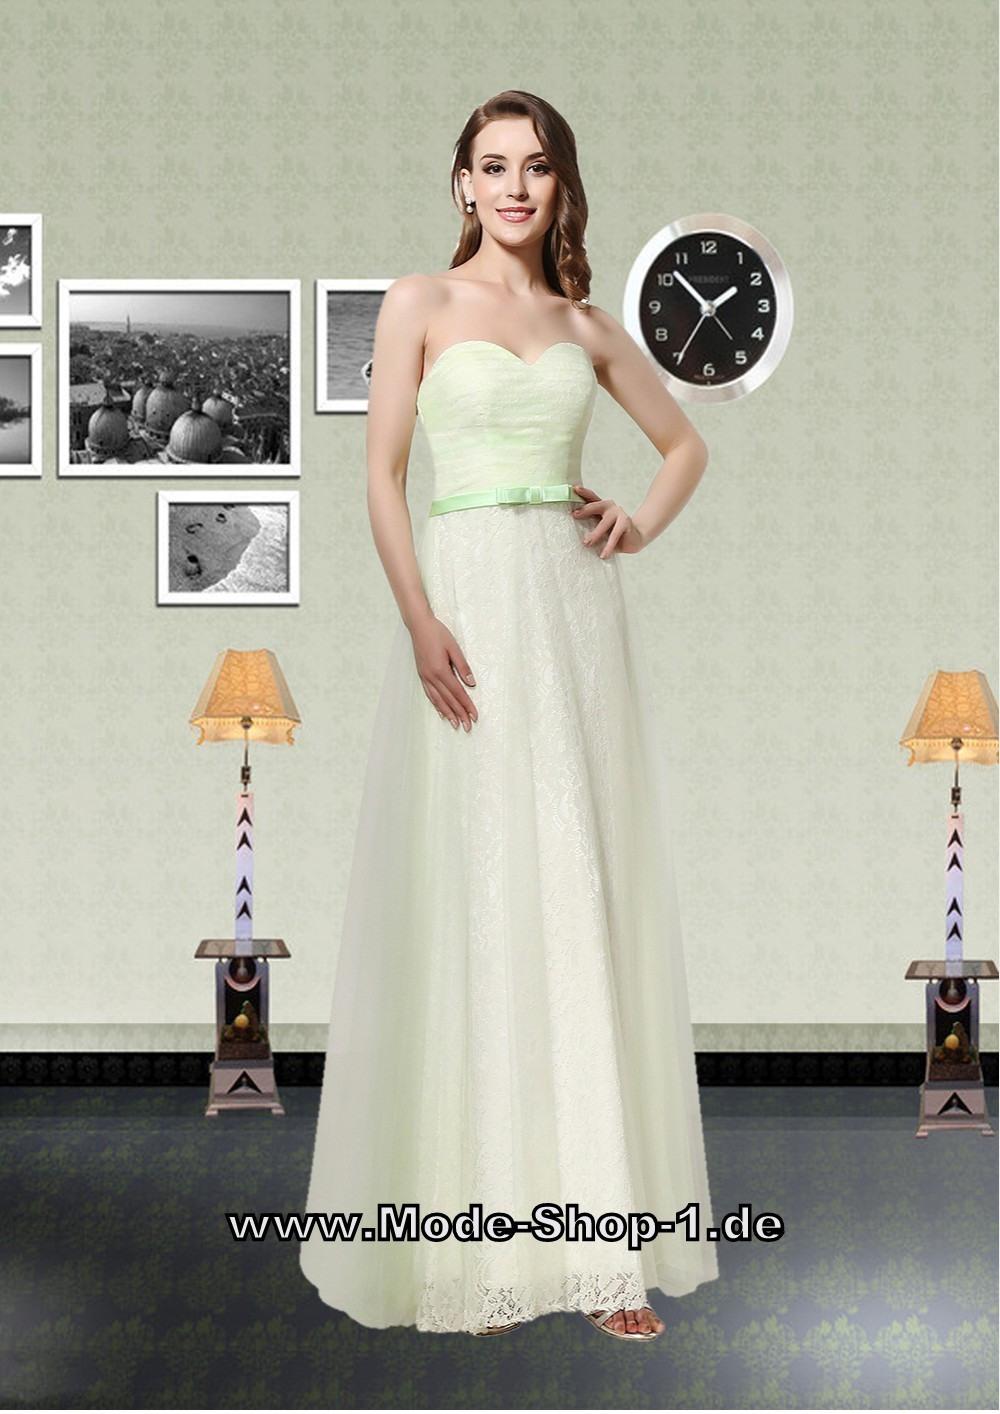 Formal Fantastisch Lange Abendkleider Online Bester PreisFormal Schön Lange Abendkleider Online Bester Preis